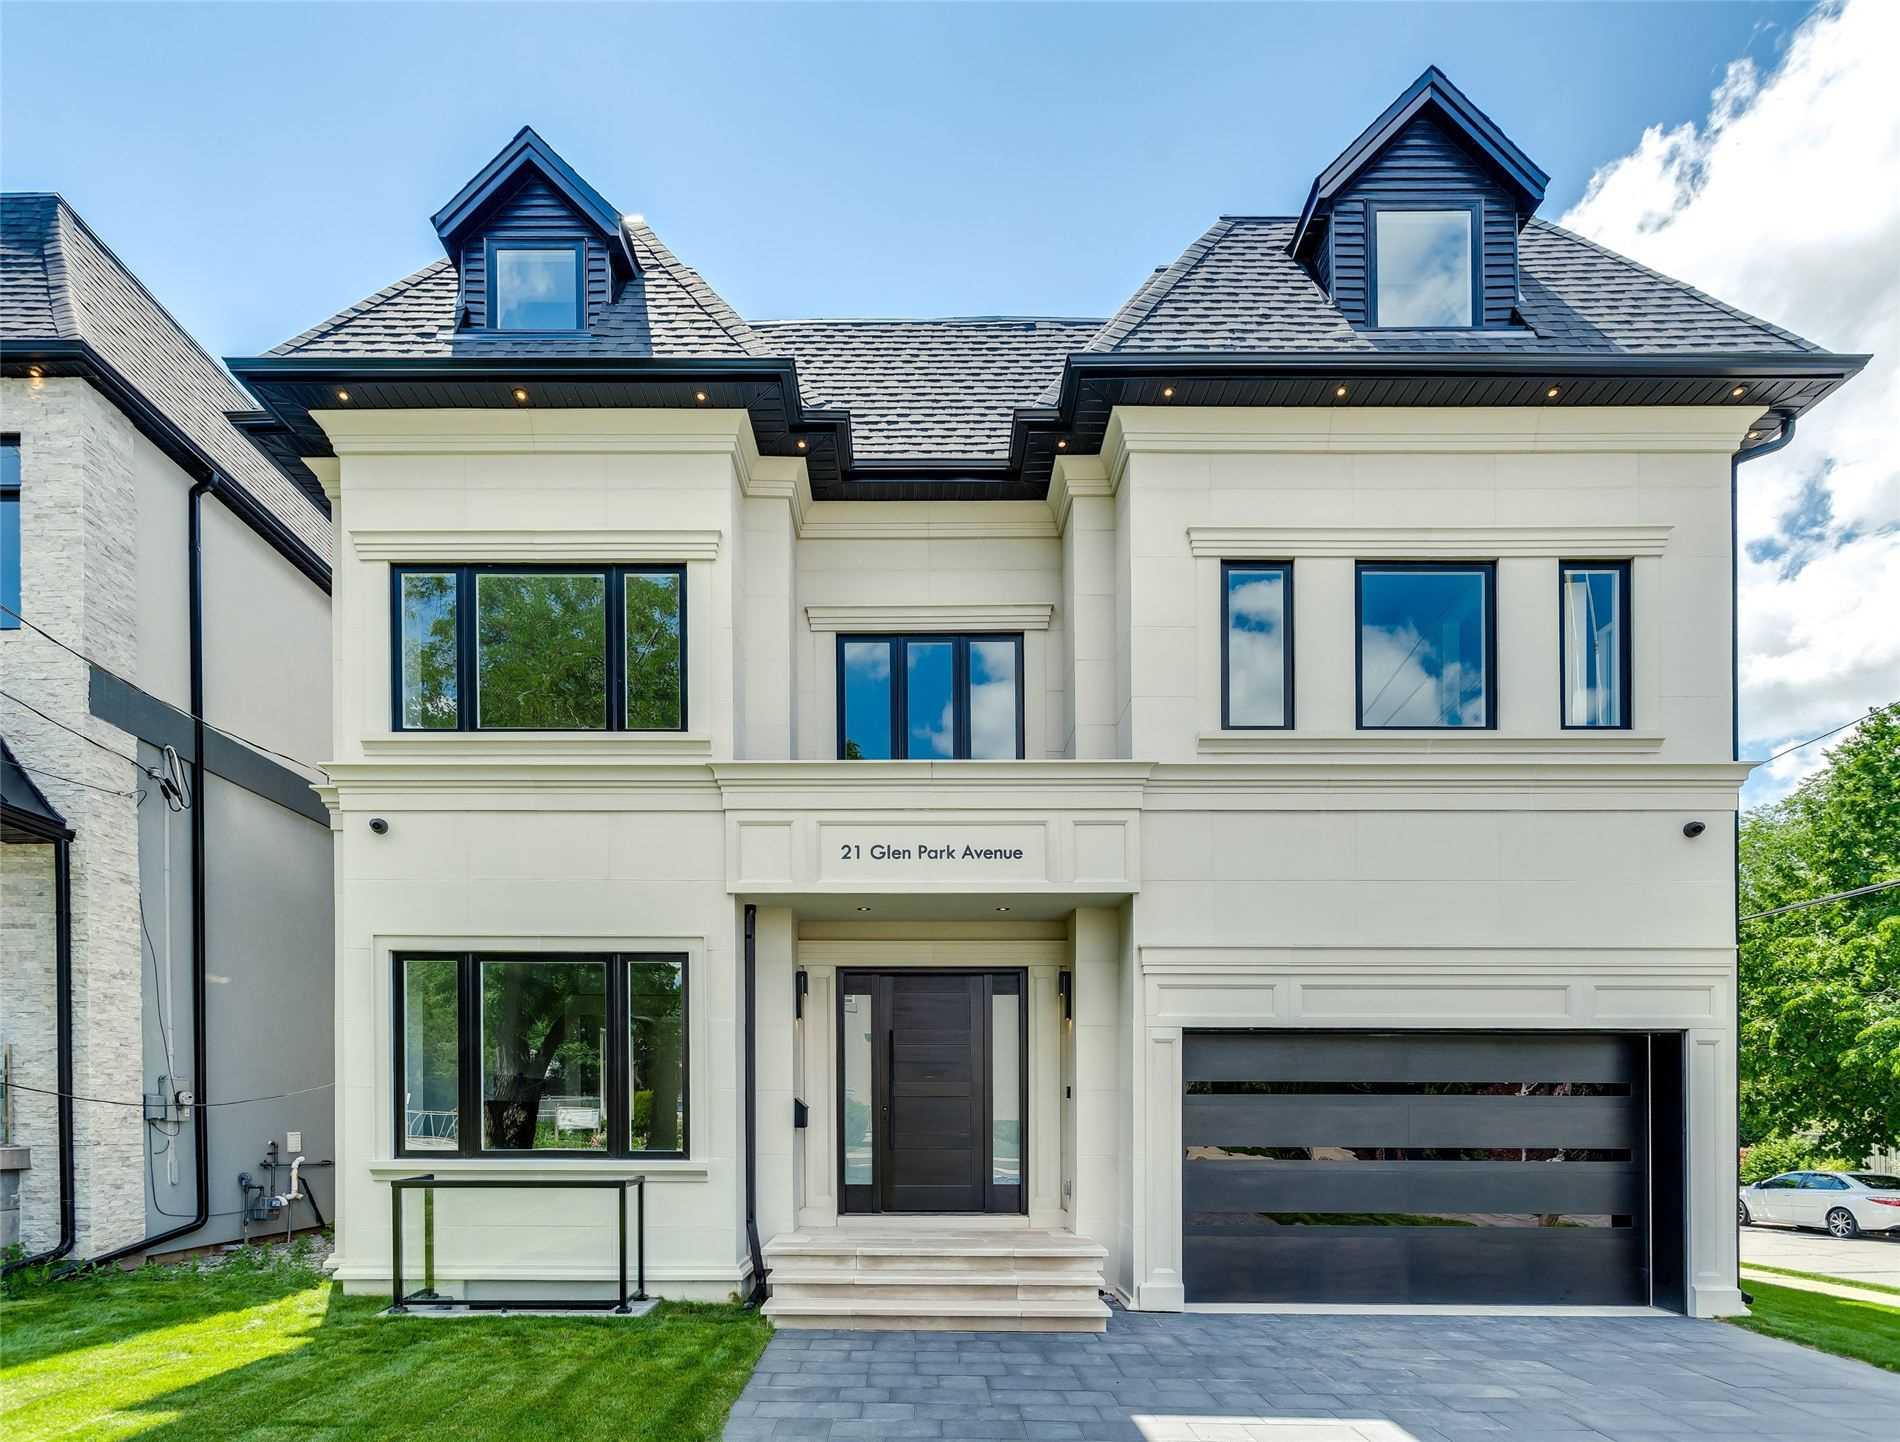 21 Glen Park Ave, Toronto, Ontario M2B2B8, 6 Bedrooms Bedrooms, 12 Rooms Rooms,6 BathroomsBathrooms,Detached,For Sale,Glen Park,C5305509